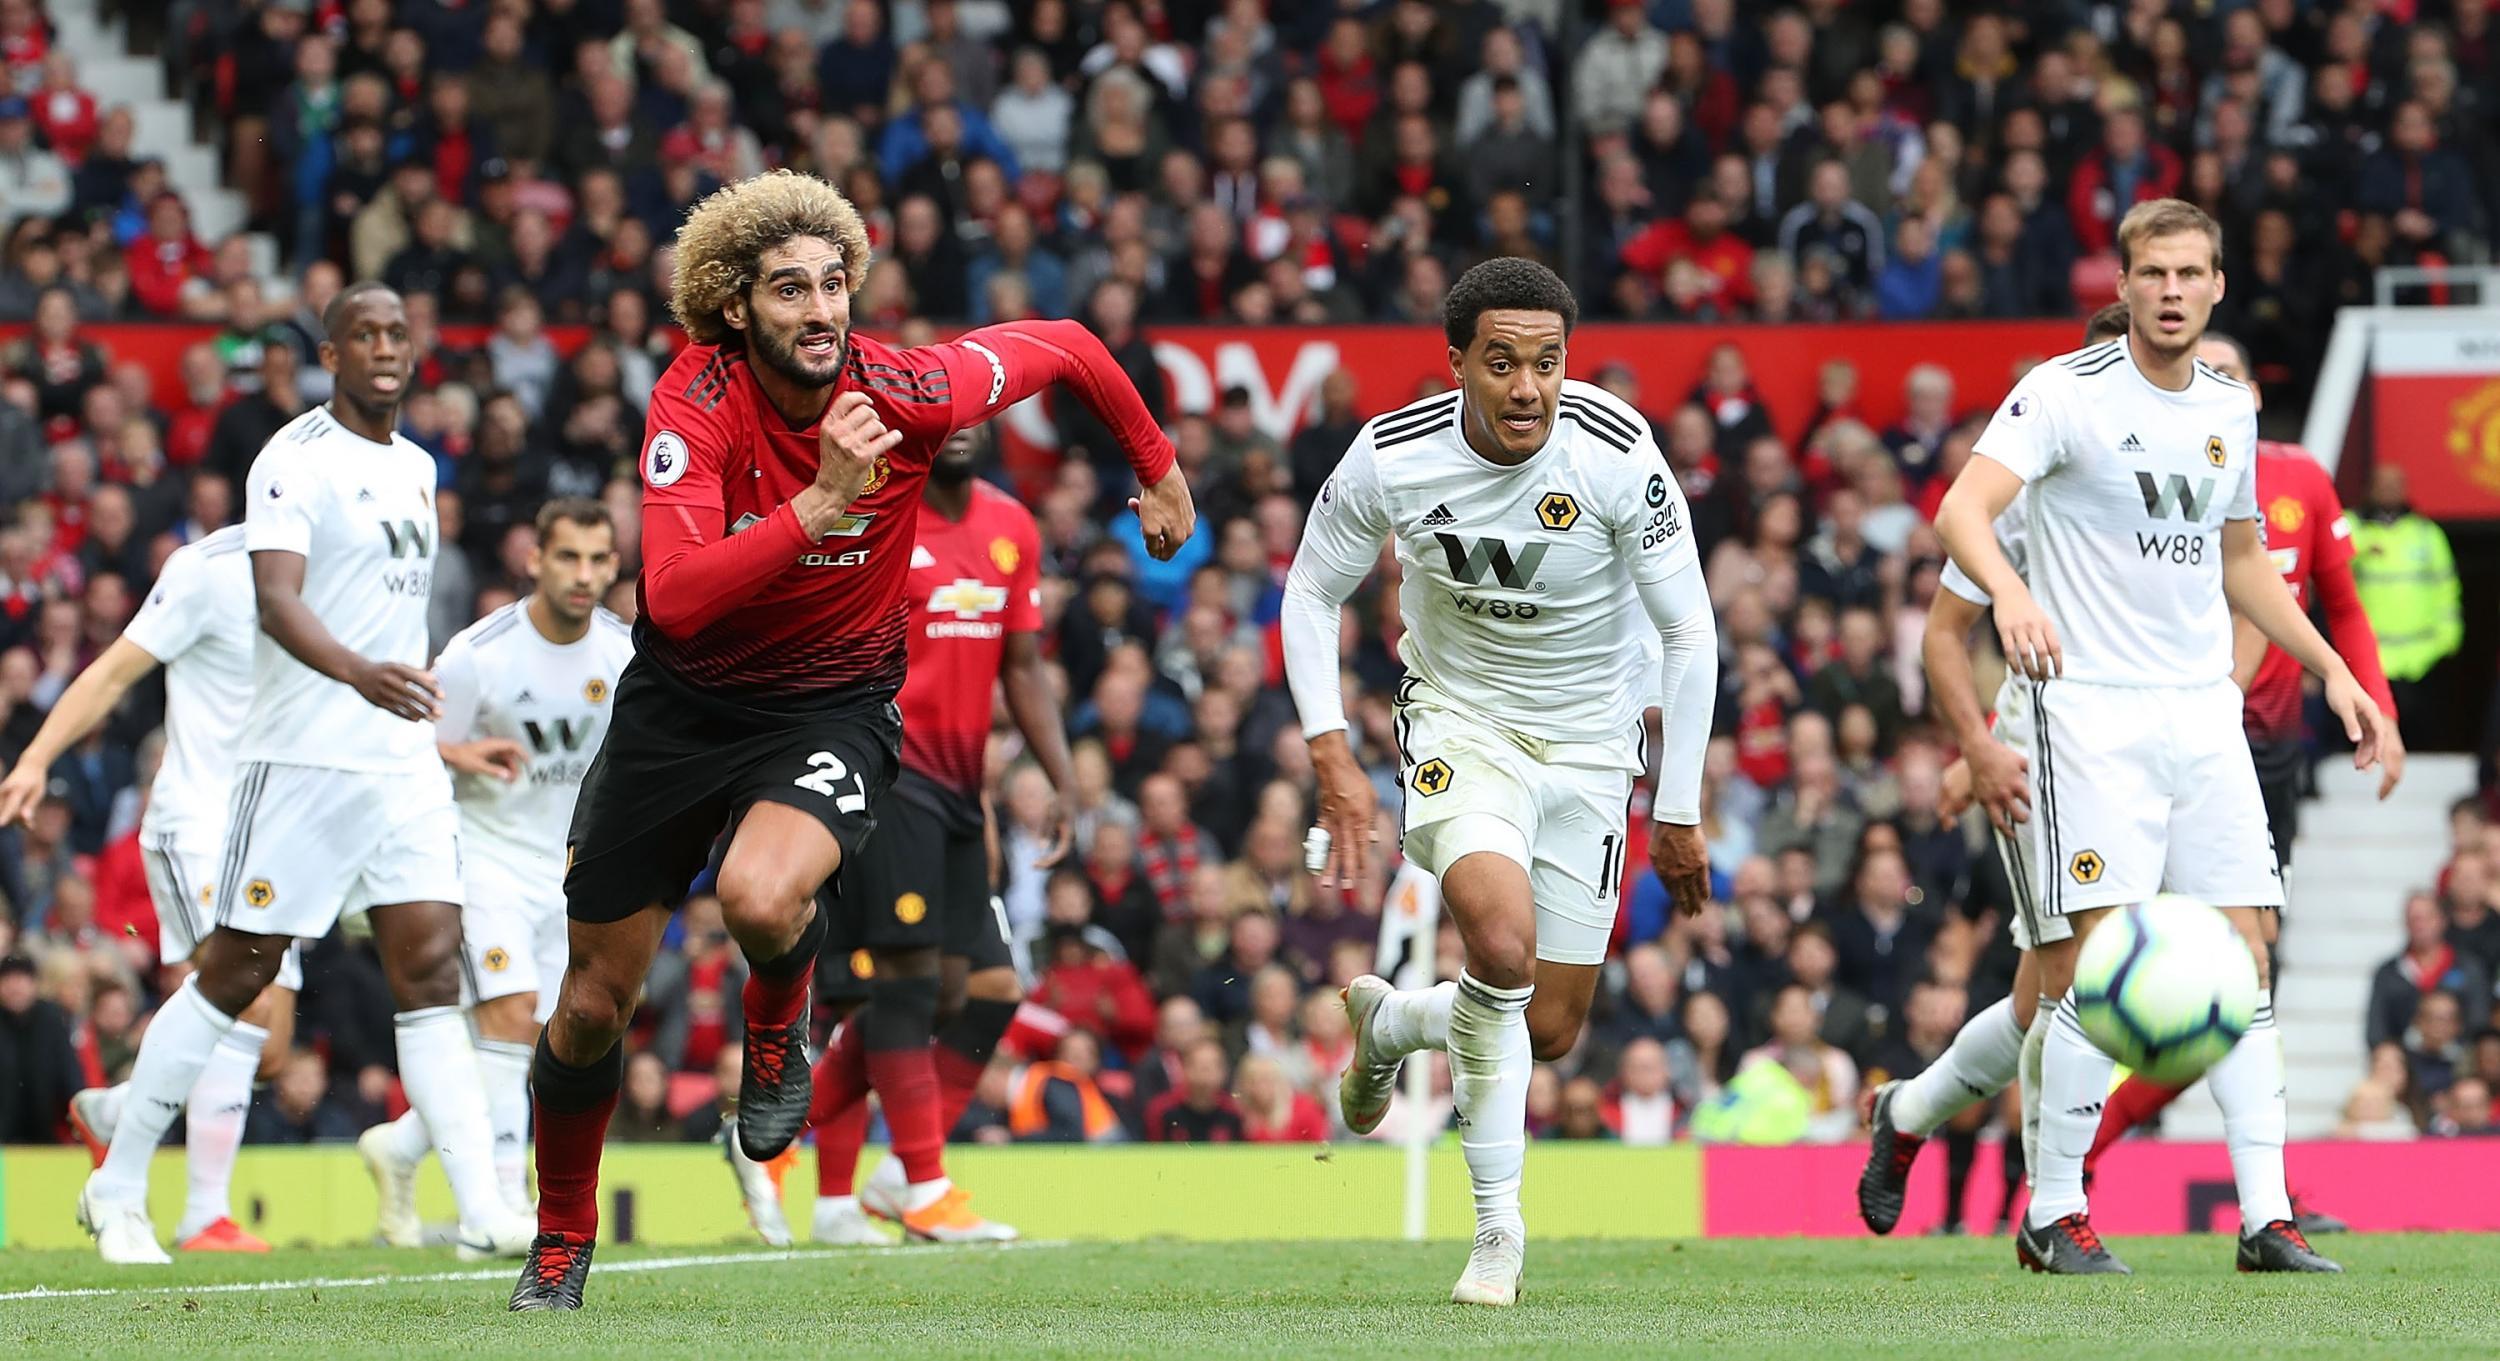 Photo of Prediksi Bola Akurat, Manchester United vs Wolverhampton 20 Agustus 2019